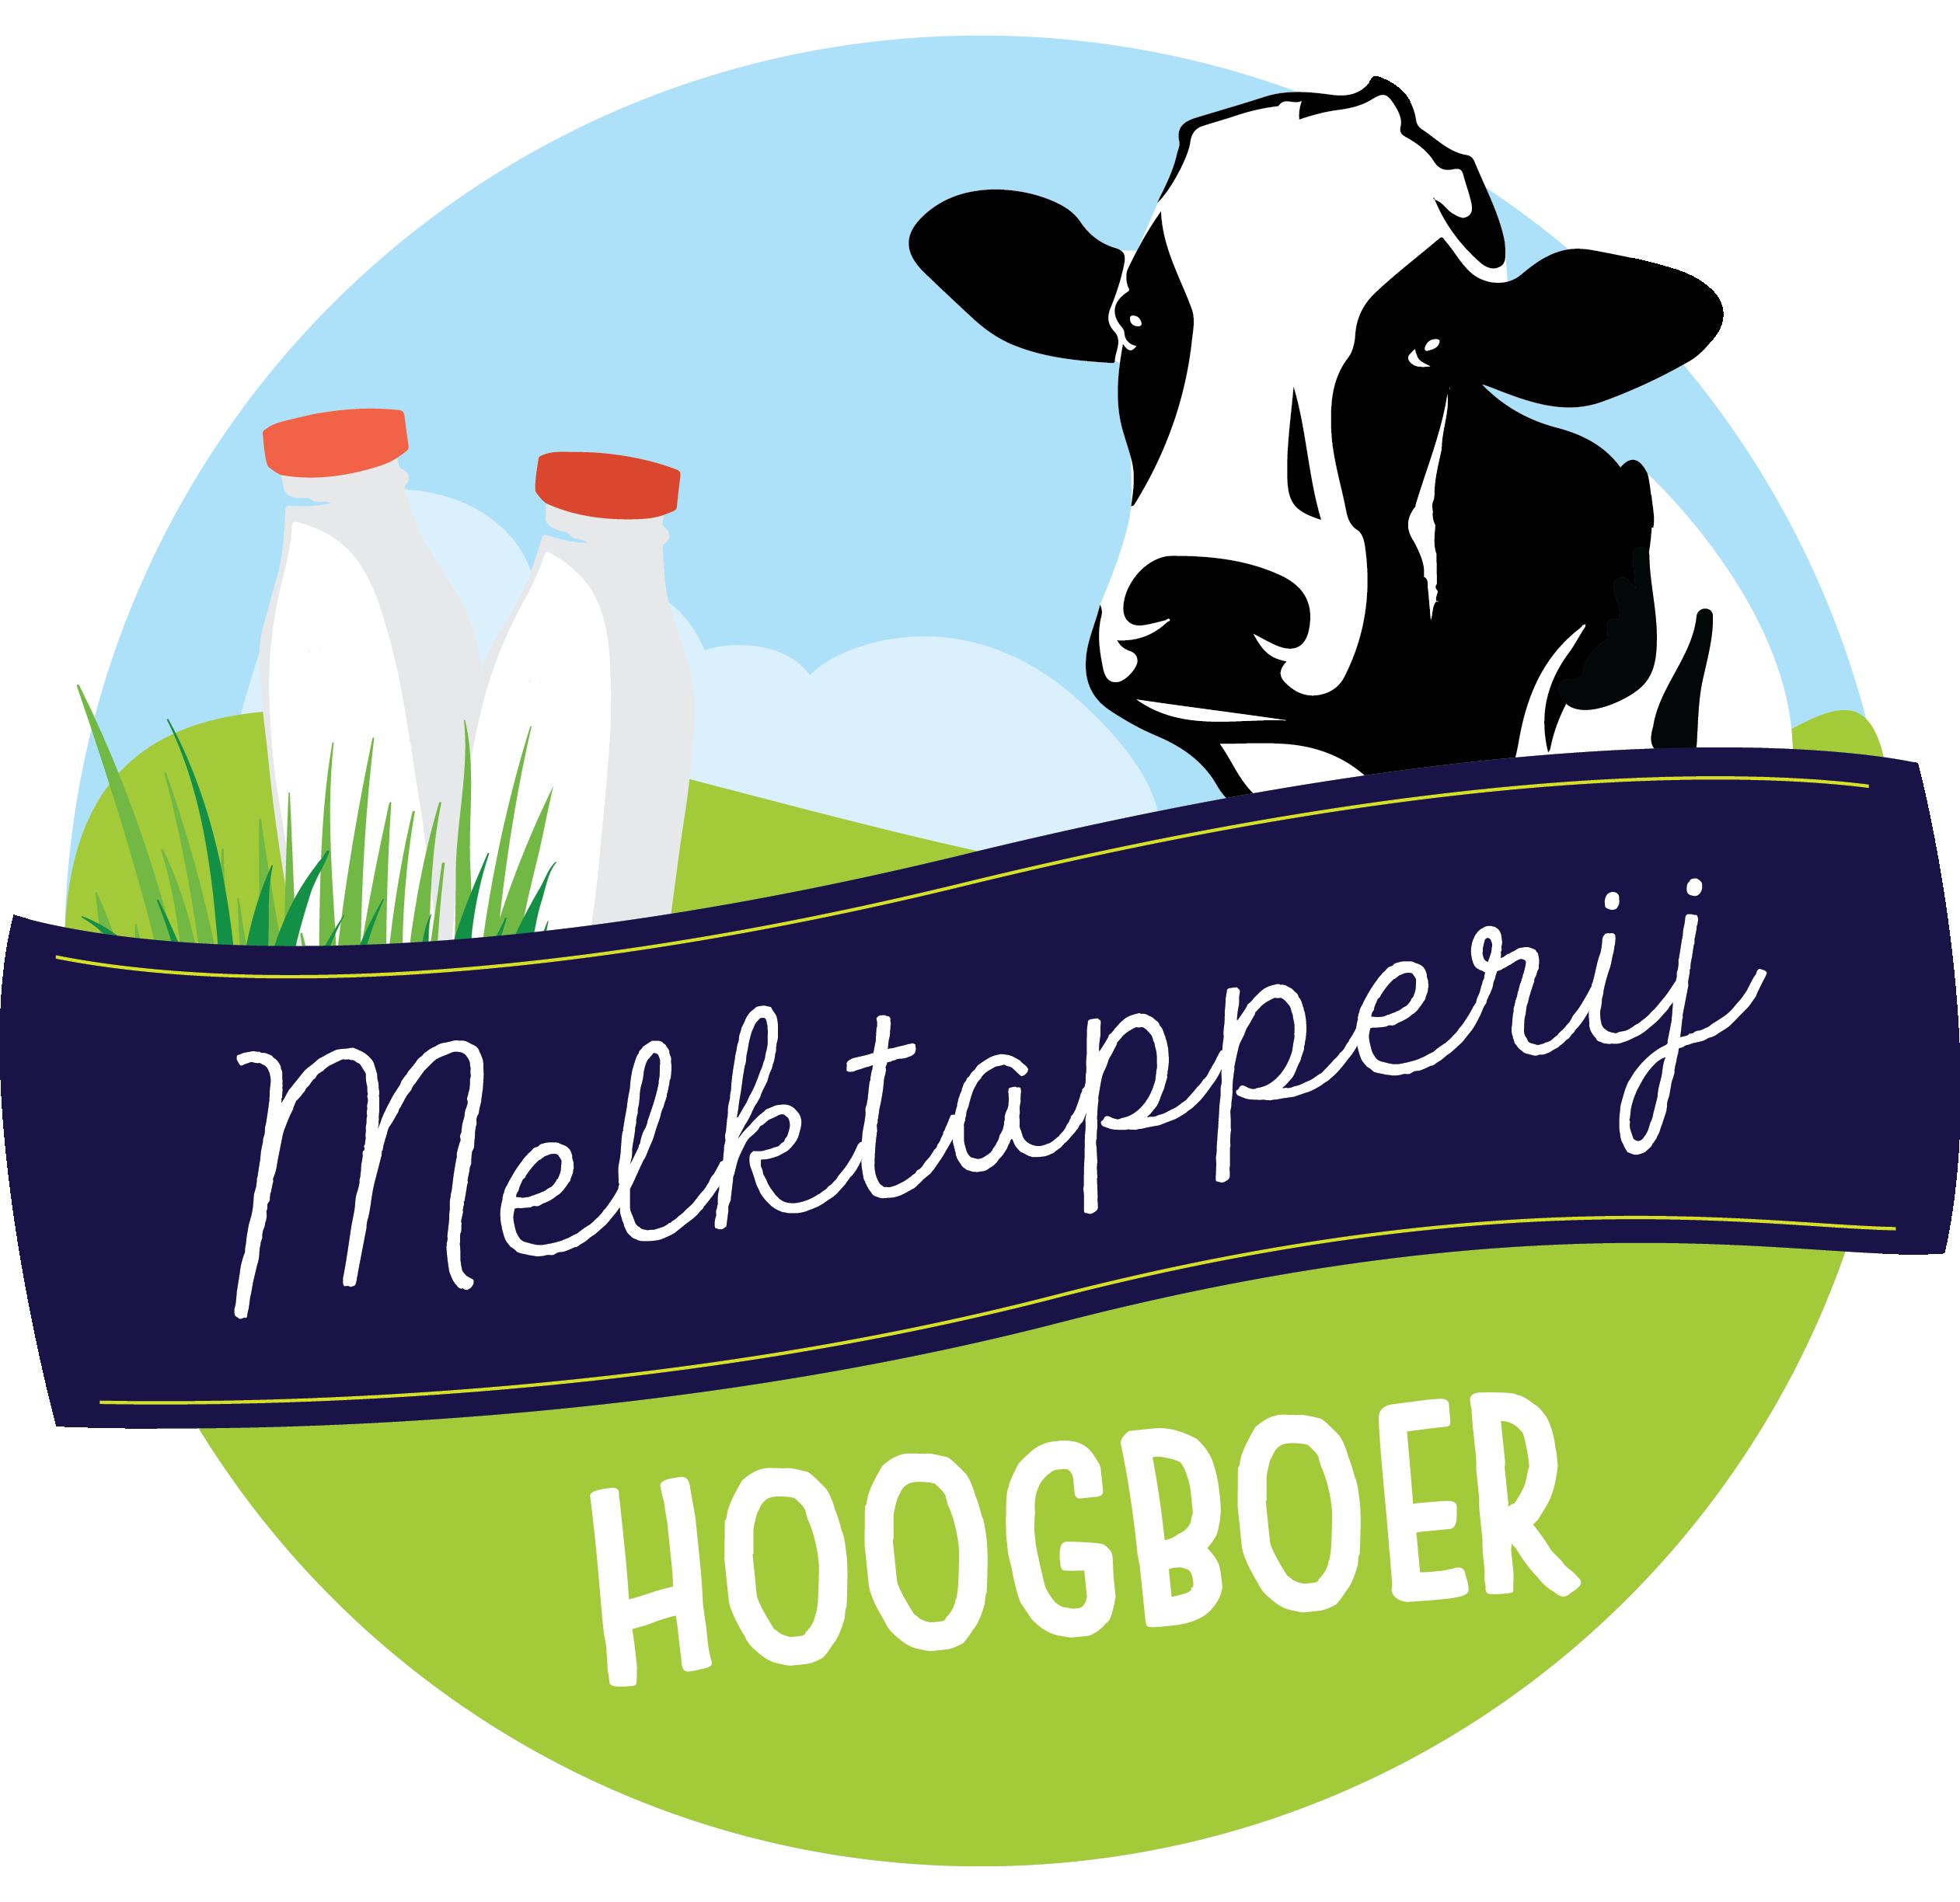 Melktapperij Hoogboer